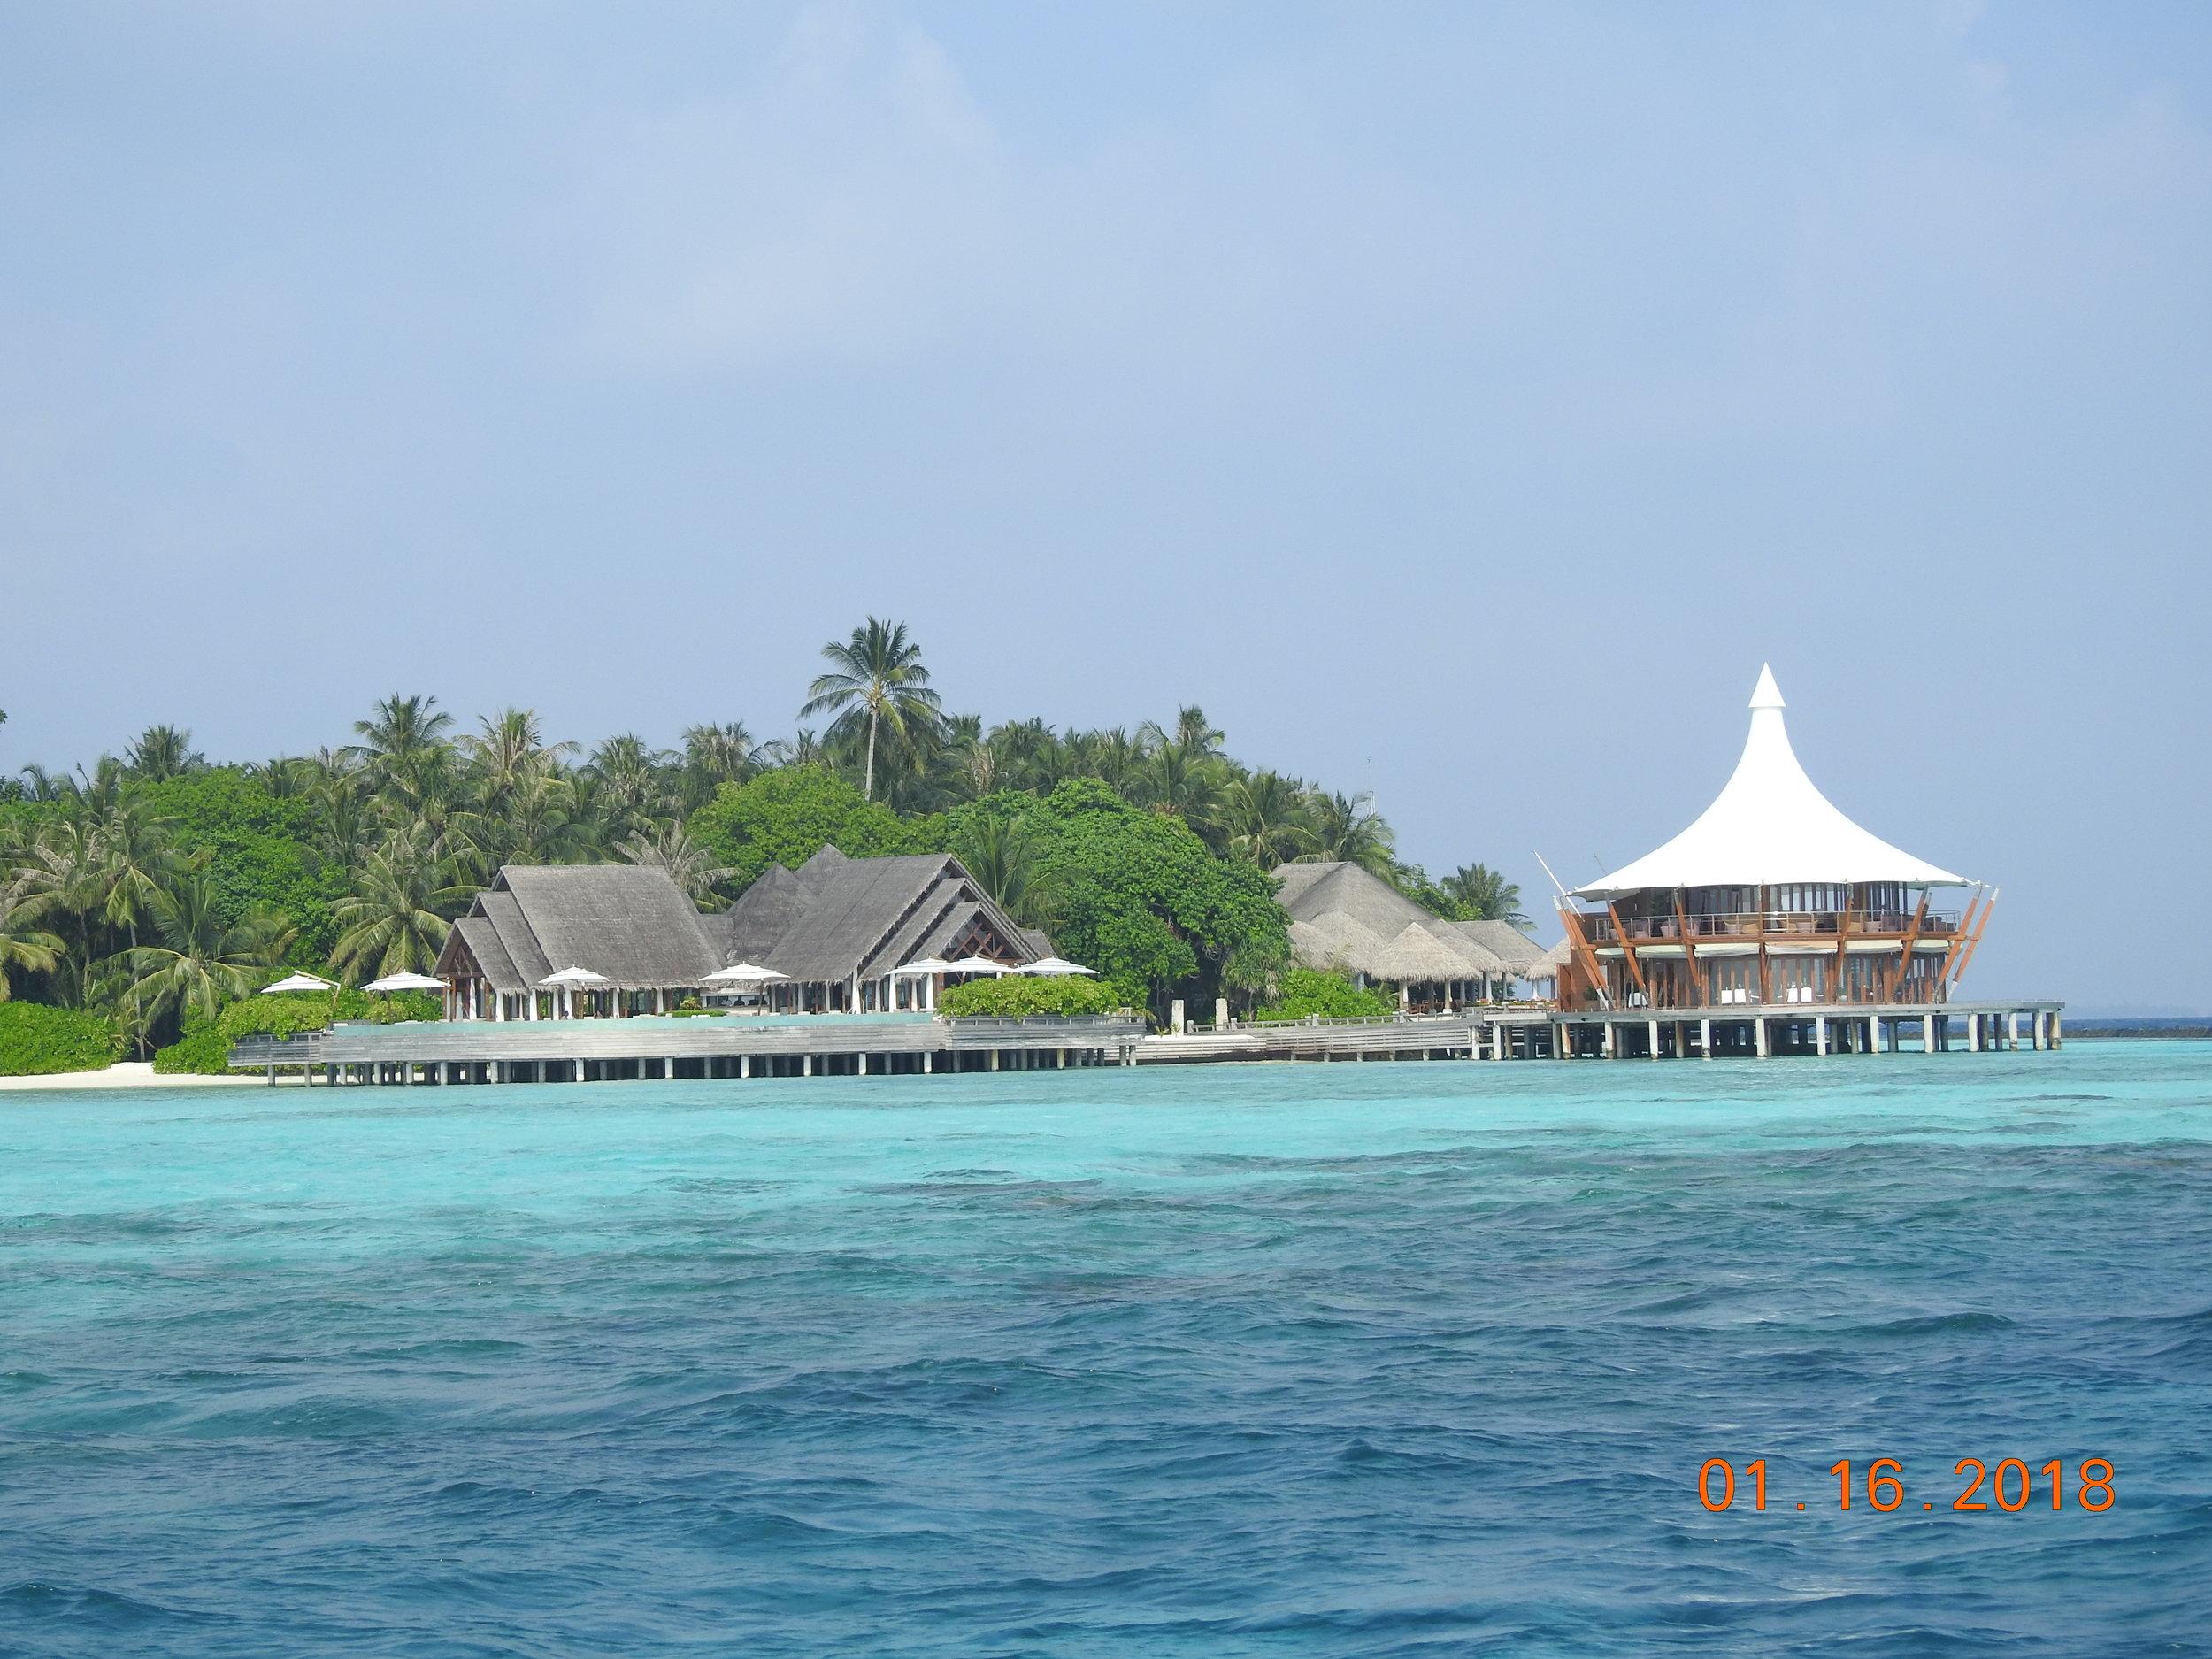 invite-to-paradise-sri-lanka-maldives-holiday-specialists-nutan-vidyut-patel-baros-2.JPG